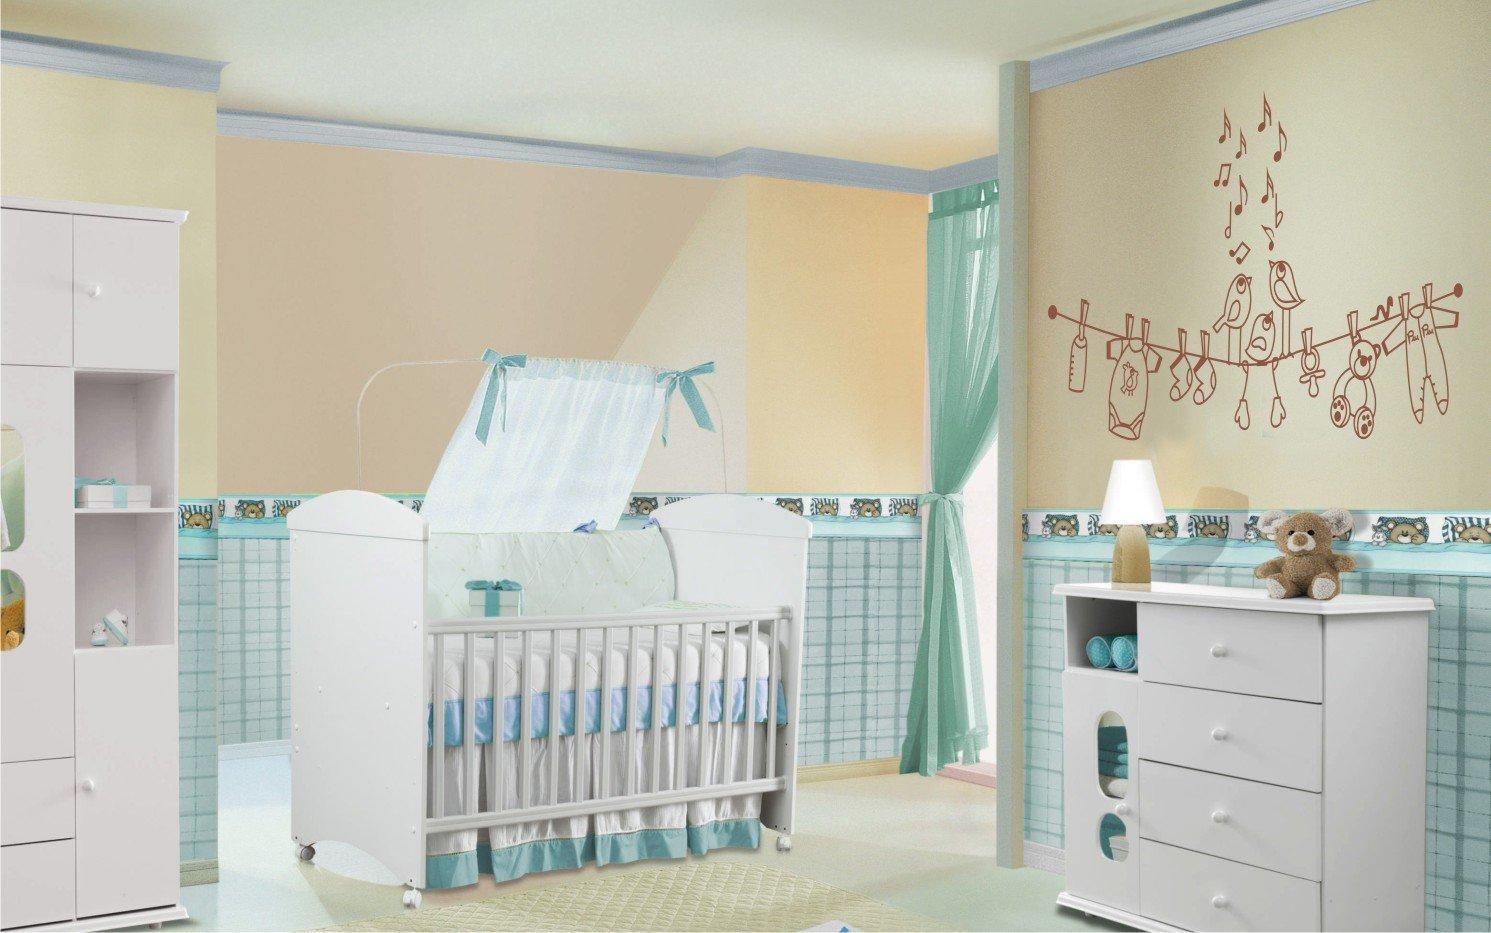 decorar-quarto-bebe-adesivos